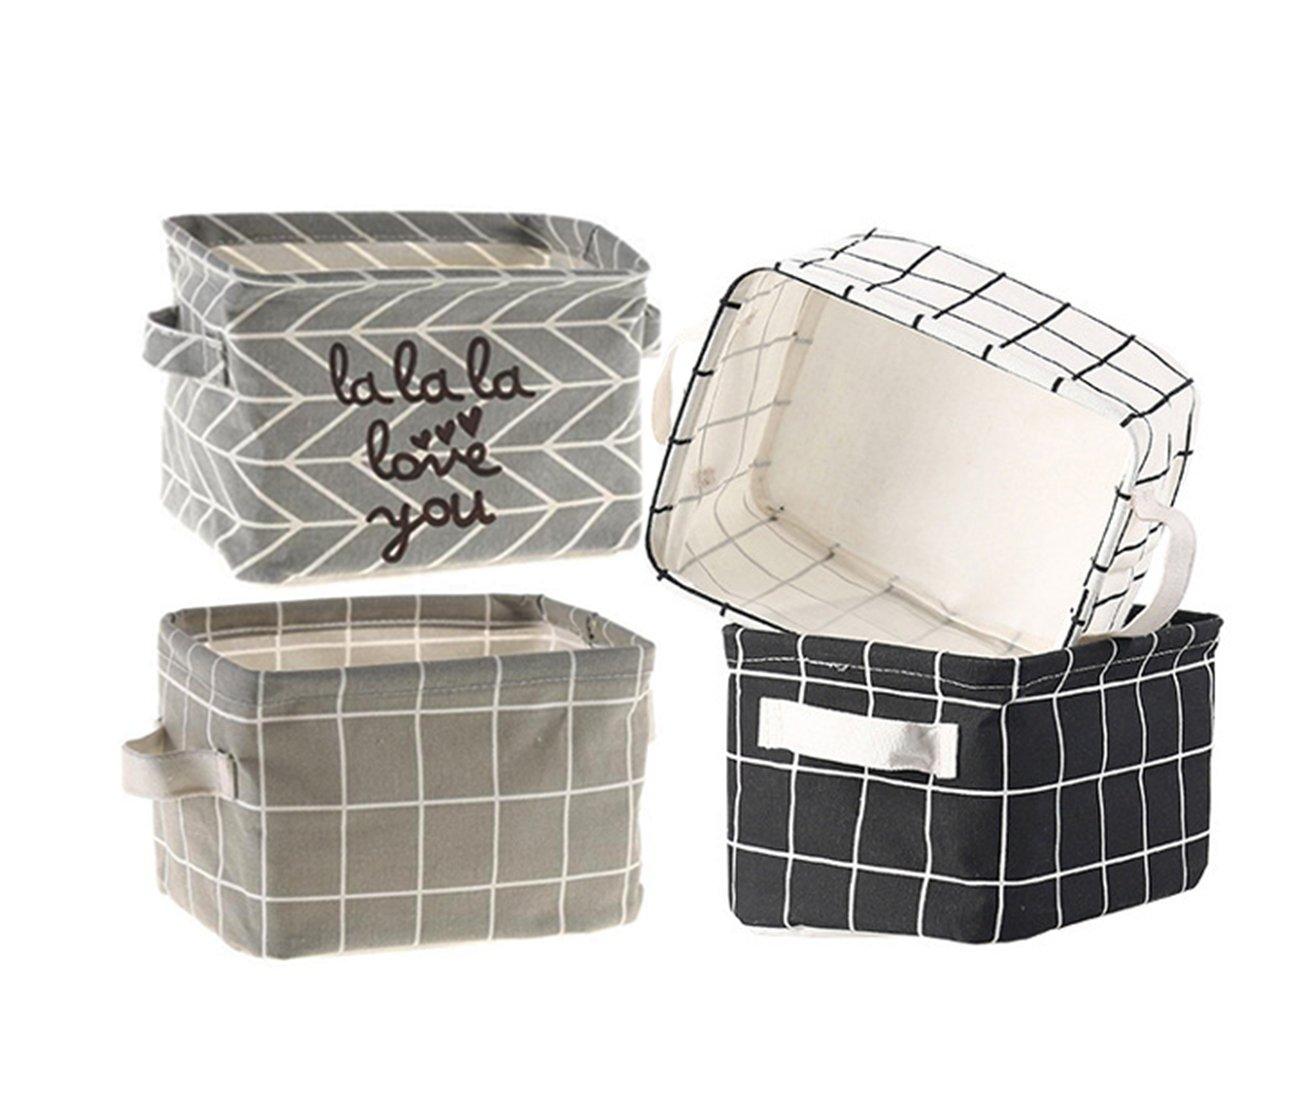 Storage Baskets Collapsible Fabric Storage Bin Organizers Box Cute Nursery for Makeup, Books, Kids Toys, Shelves & Desks Storage - Set of 4 (Grid) Mini Storage Bins